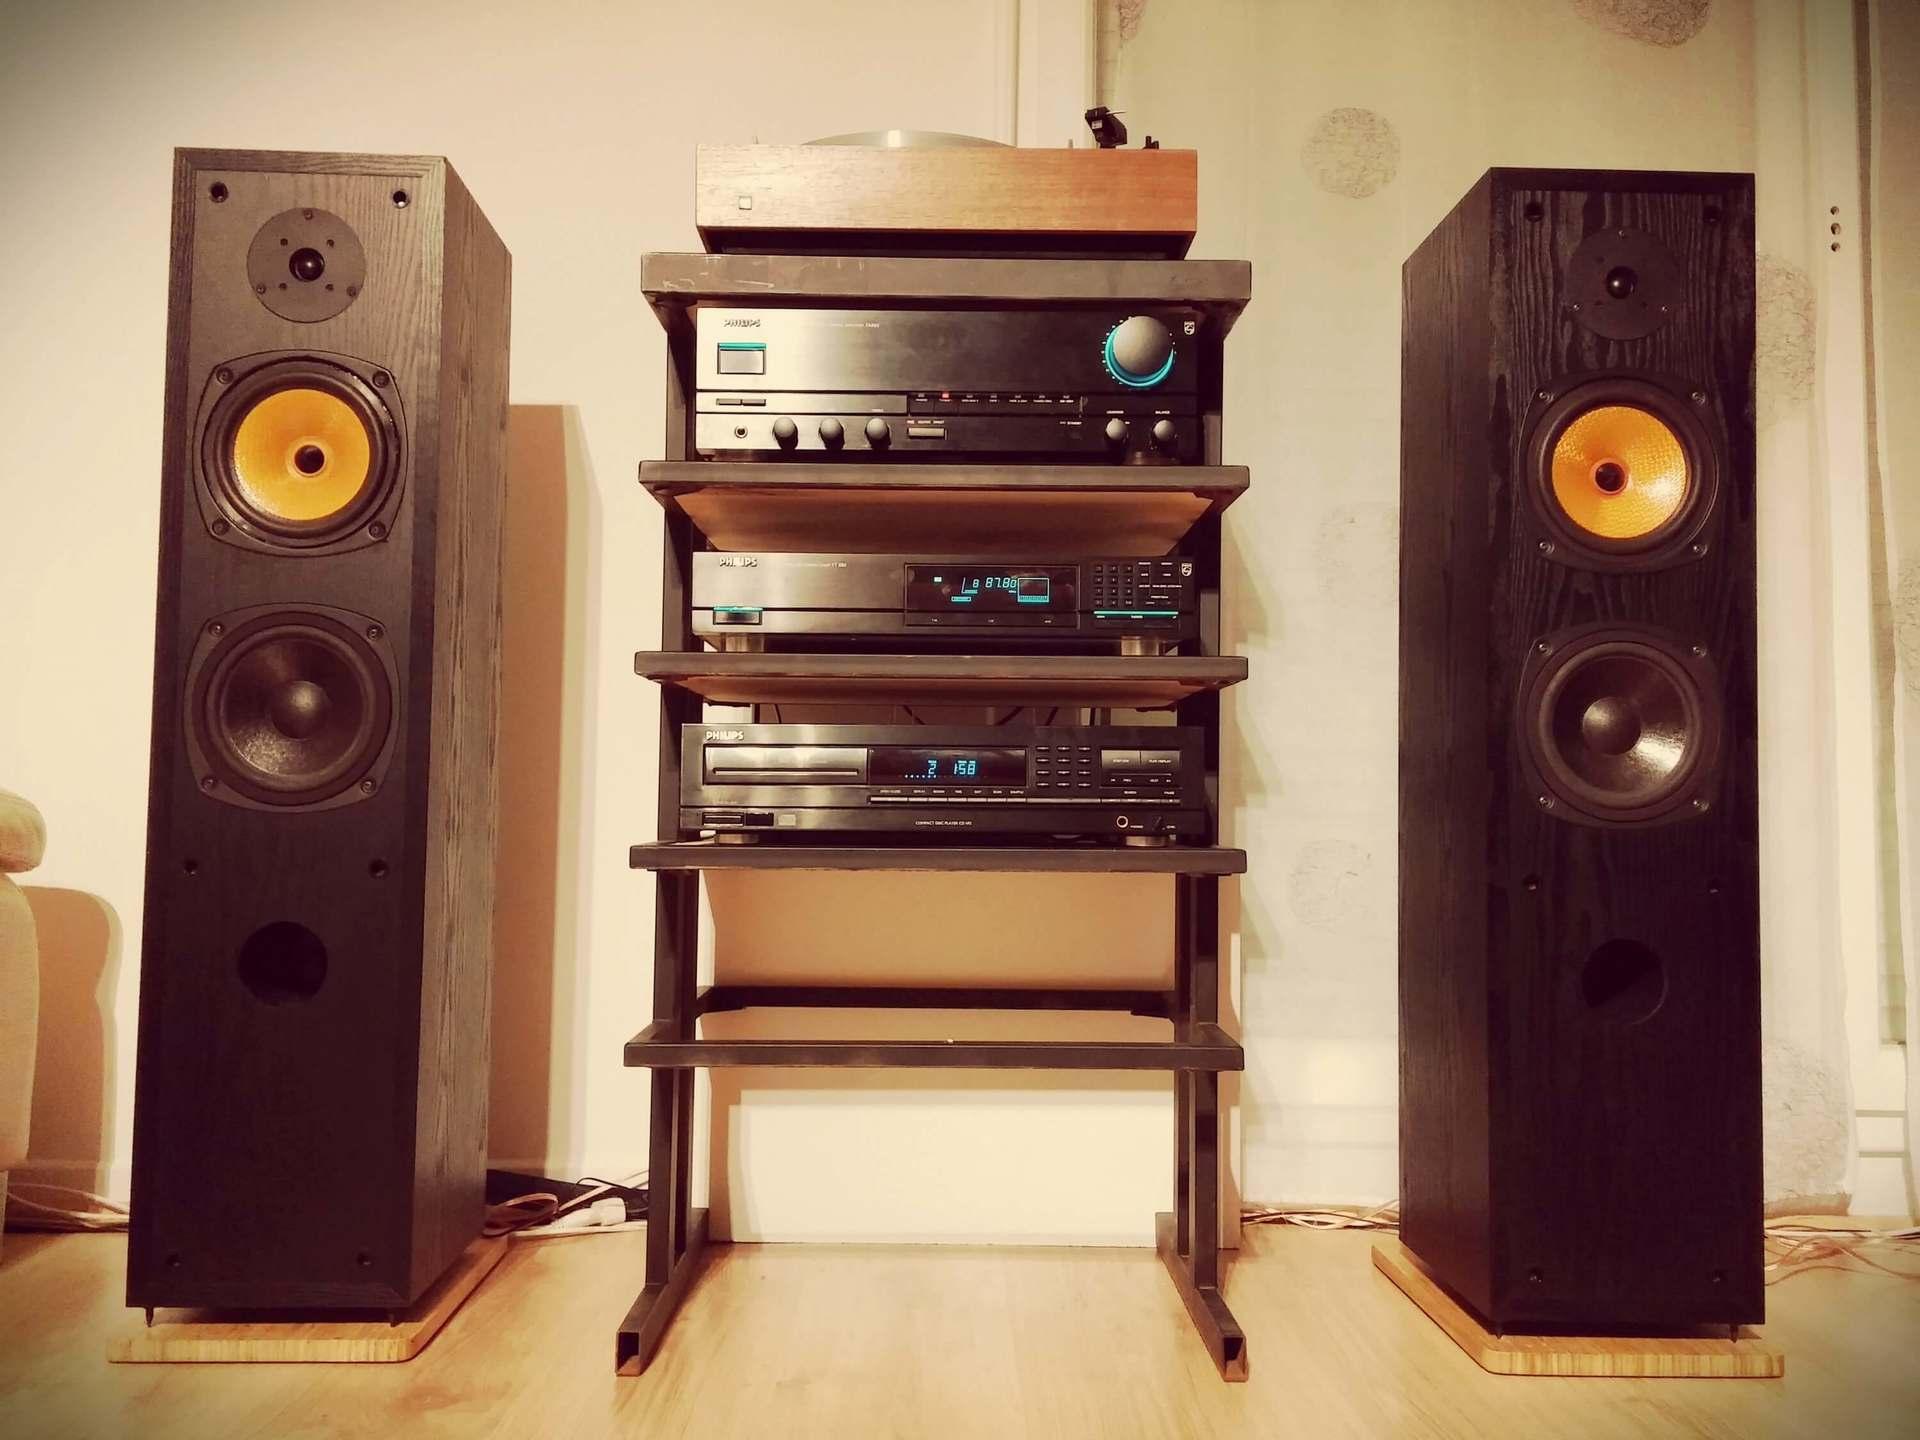 Аудиодайджест #6: «Сделай сам», интересное о звуке и аудиотехнологиях - 1